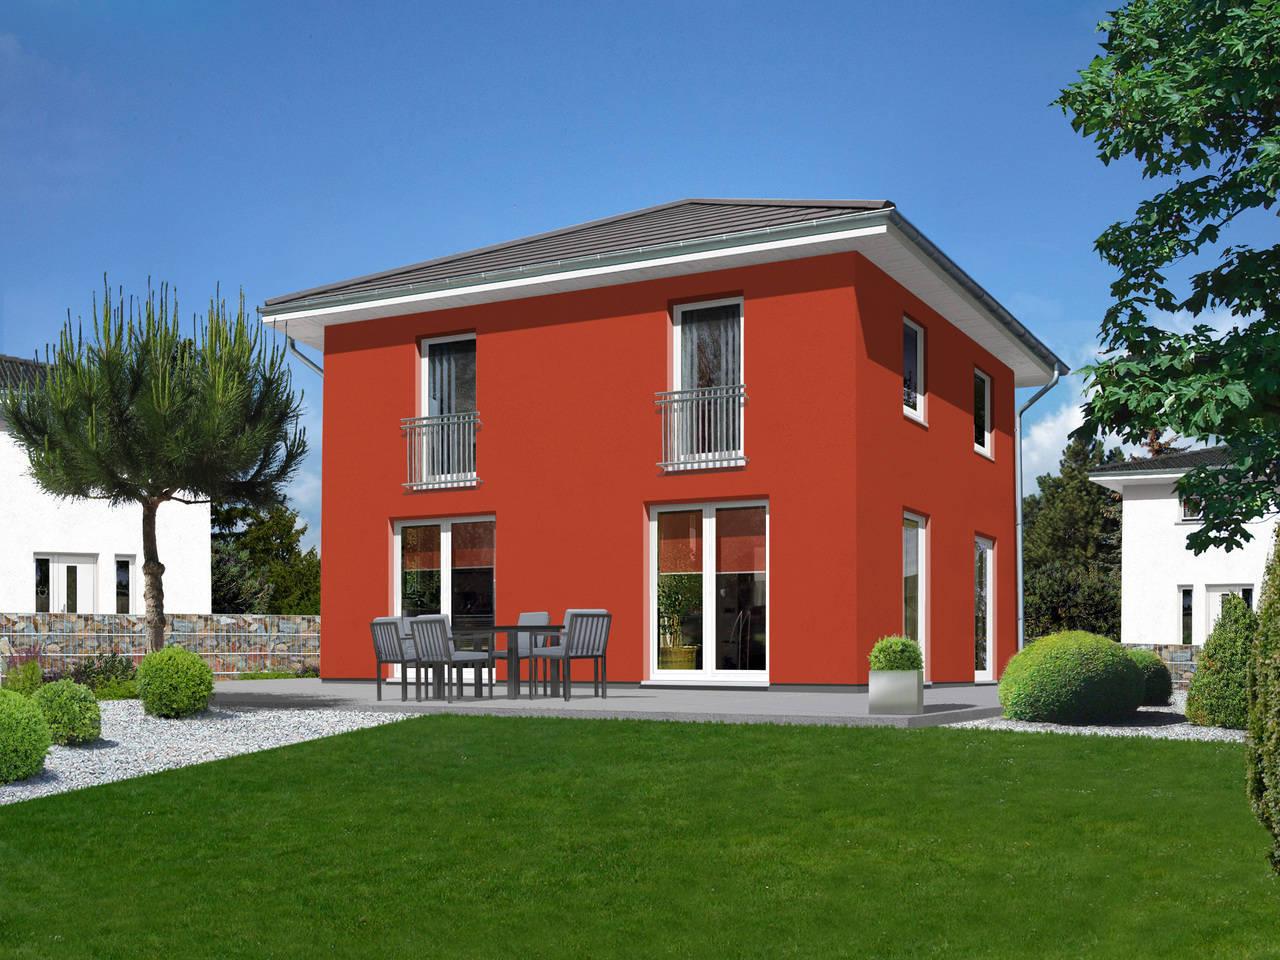 Stadthaus Flair A3 von FIMA Hausbau